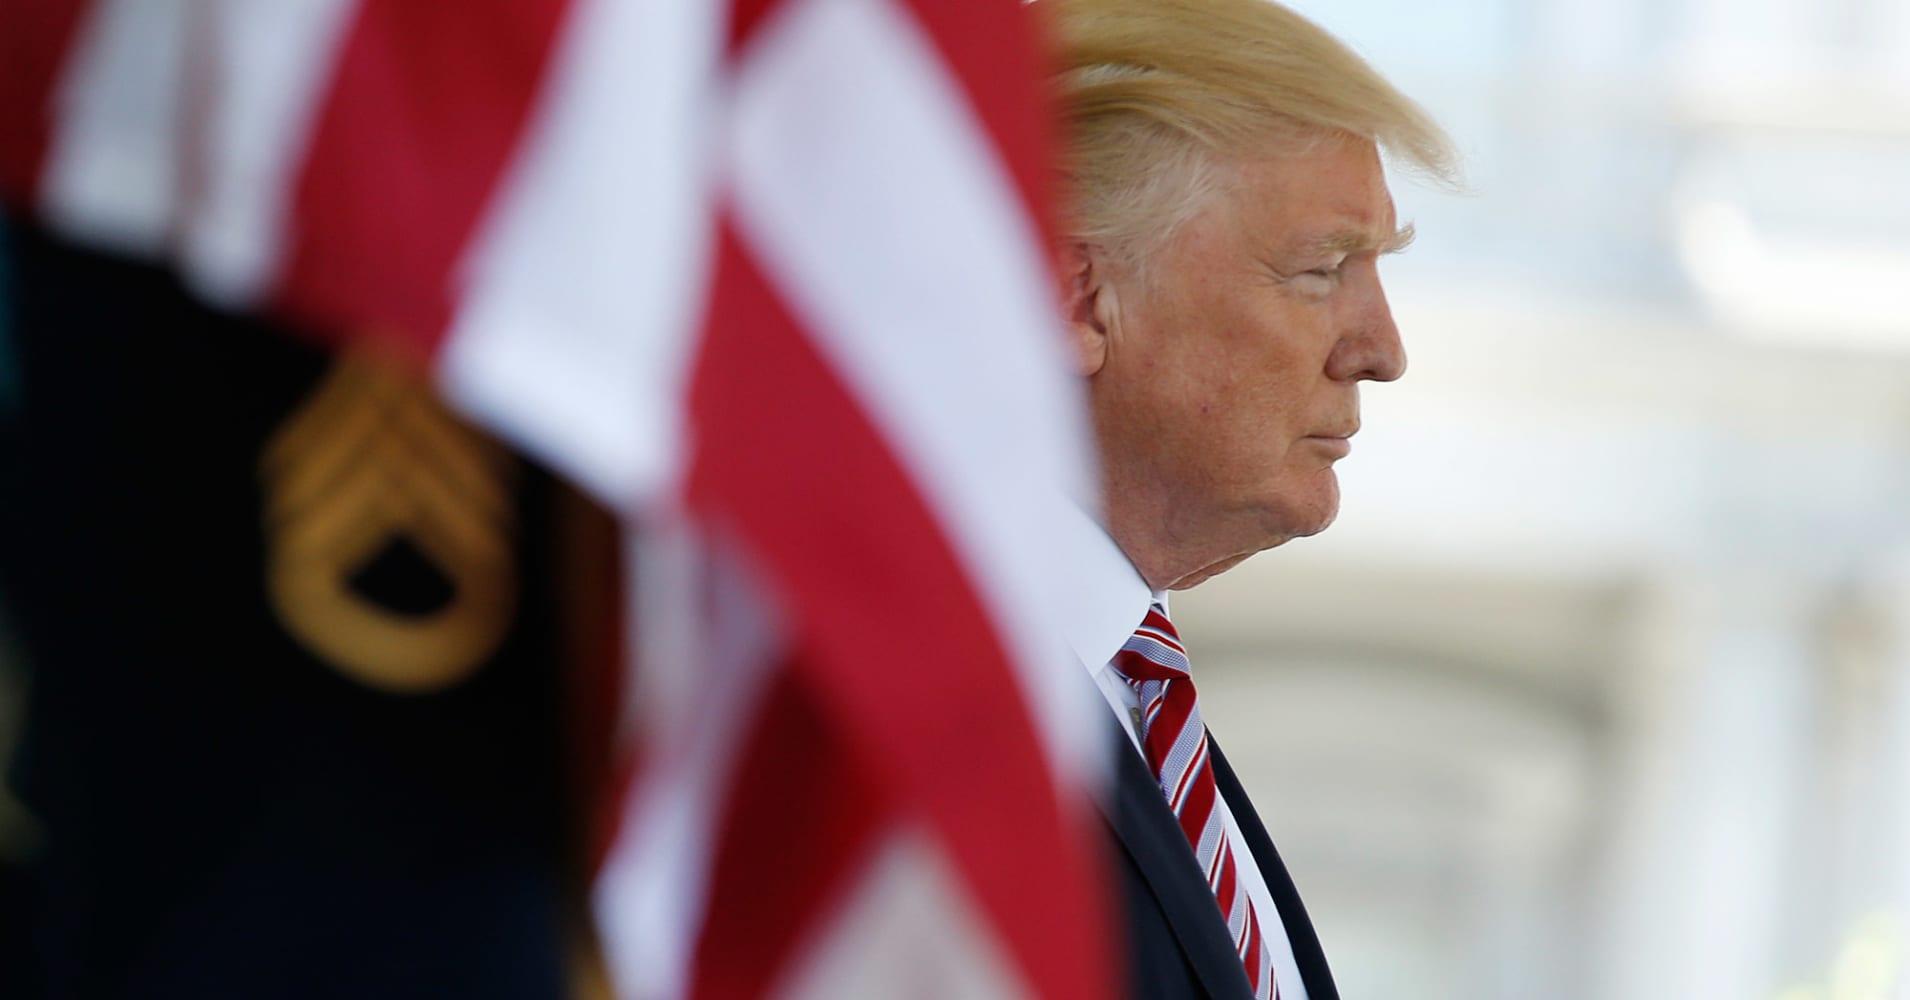 Manchester Arena suicide attack: Trump calls terrorists 'evil losers'